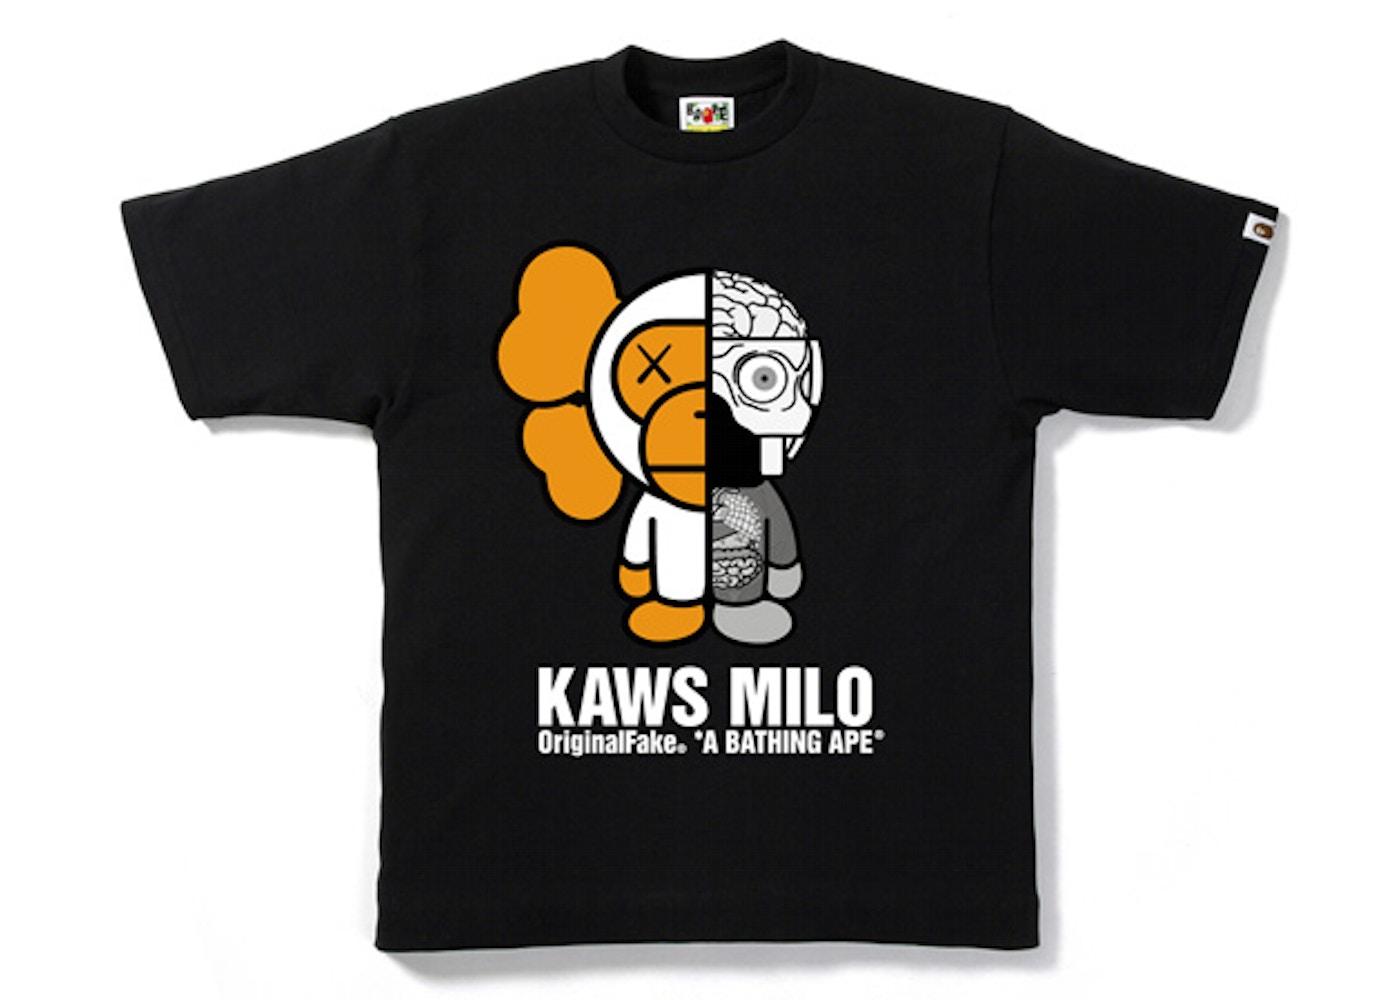 Bape X Kaws >> Bape X Originalfake Kaws Companion Milo Tee Black White Ss10